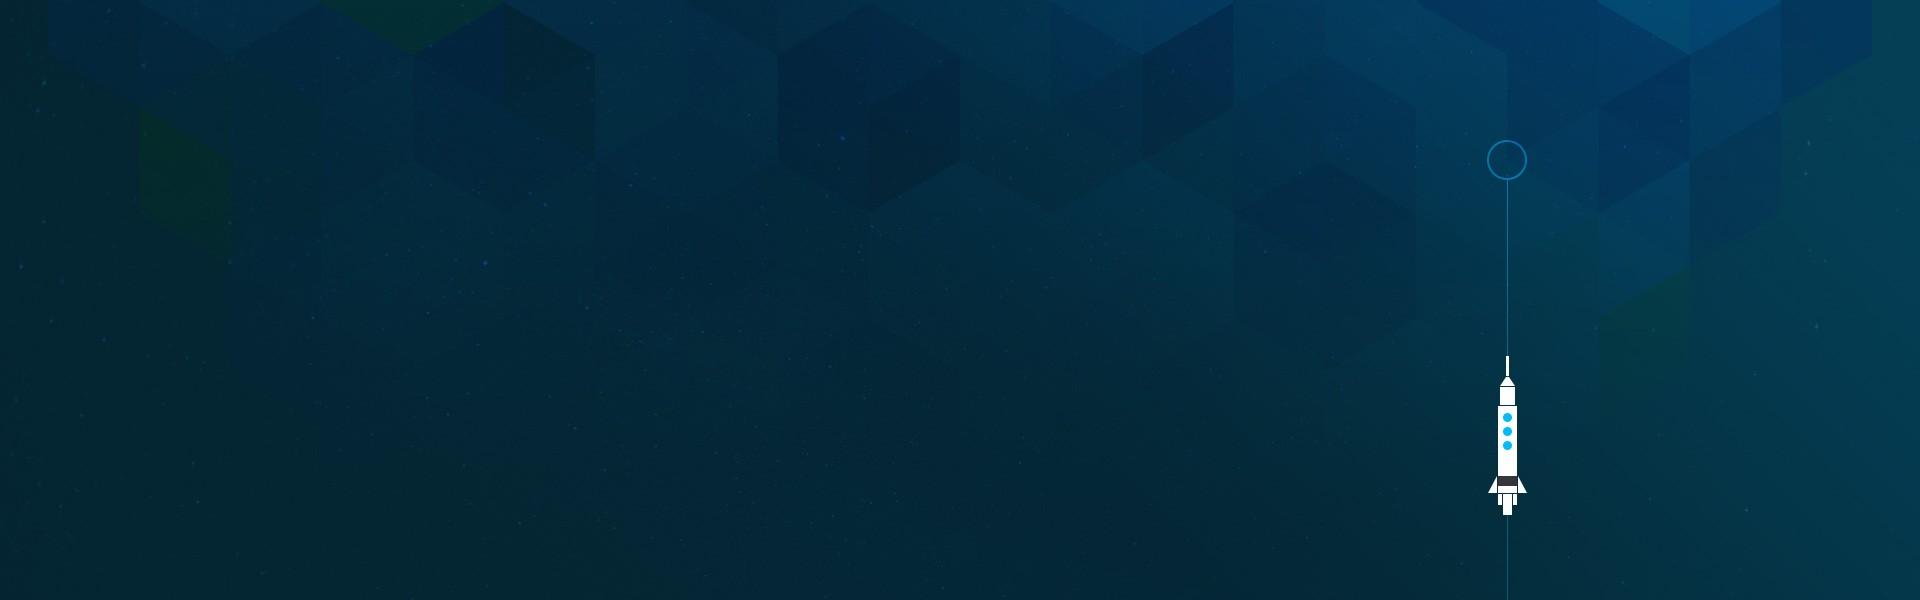 bg-homepage.jpg